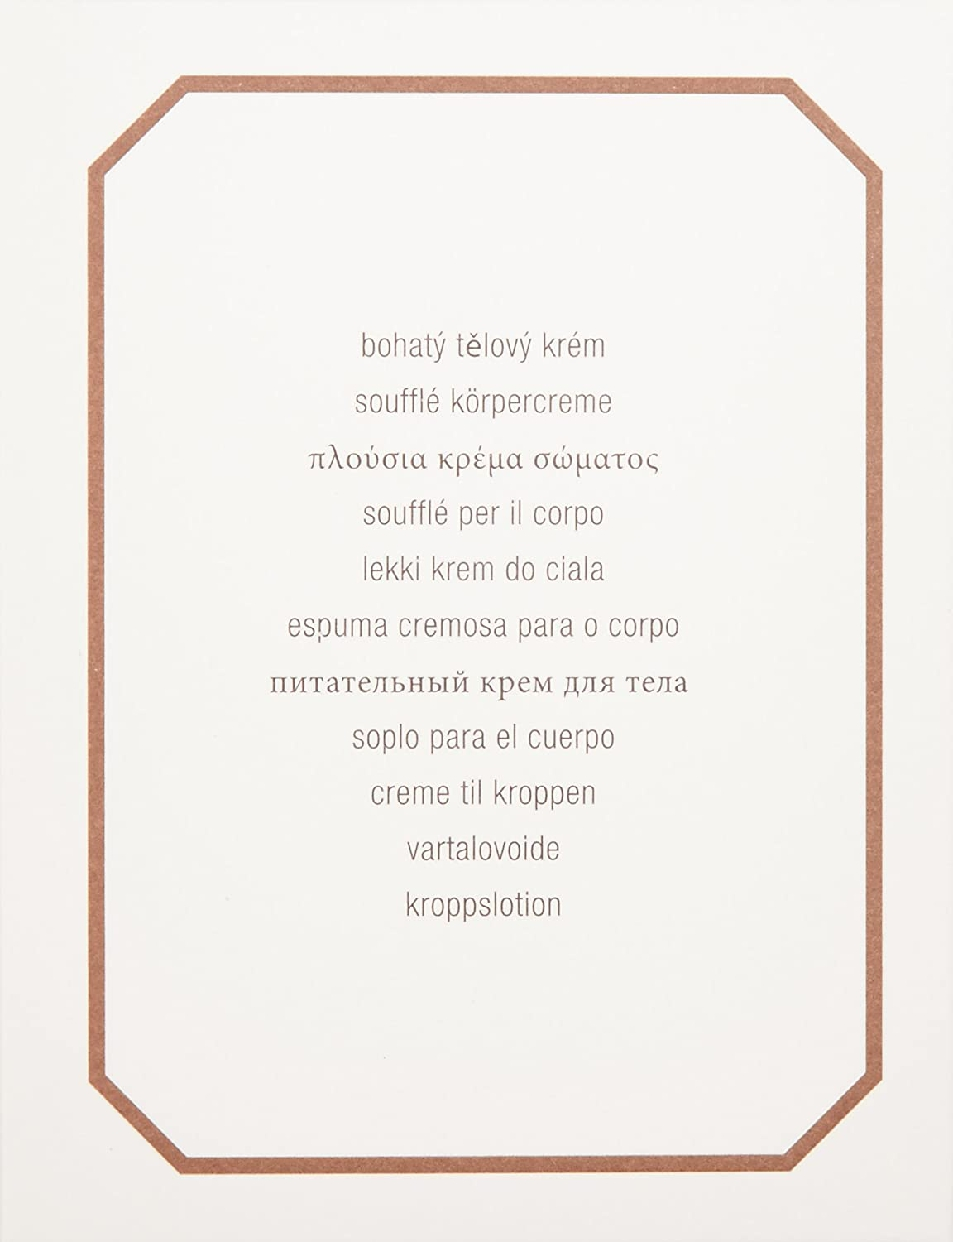 Laura Mercier(ローラ メルシエ)ホイップトボディクリーム アンバーバニラの商品画像5